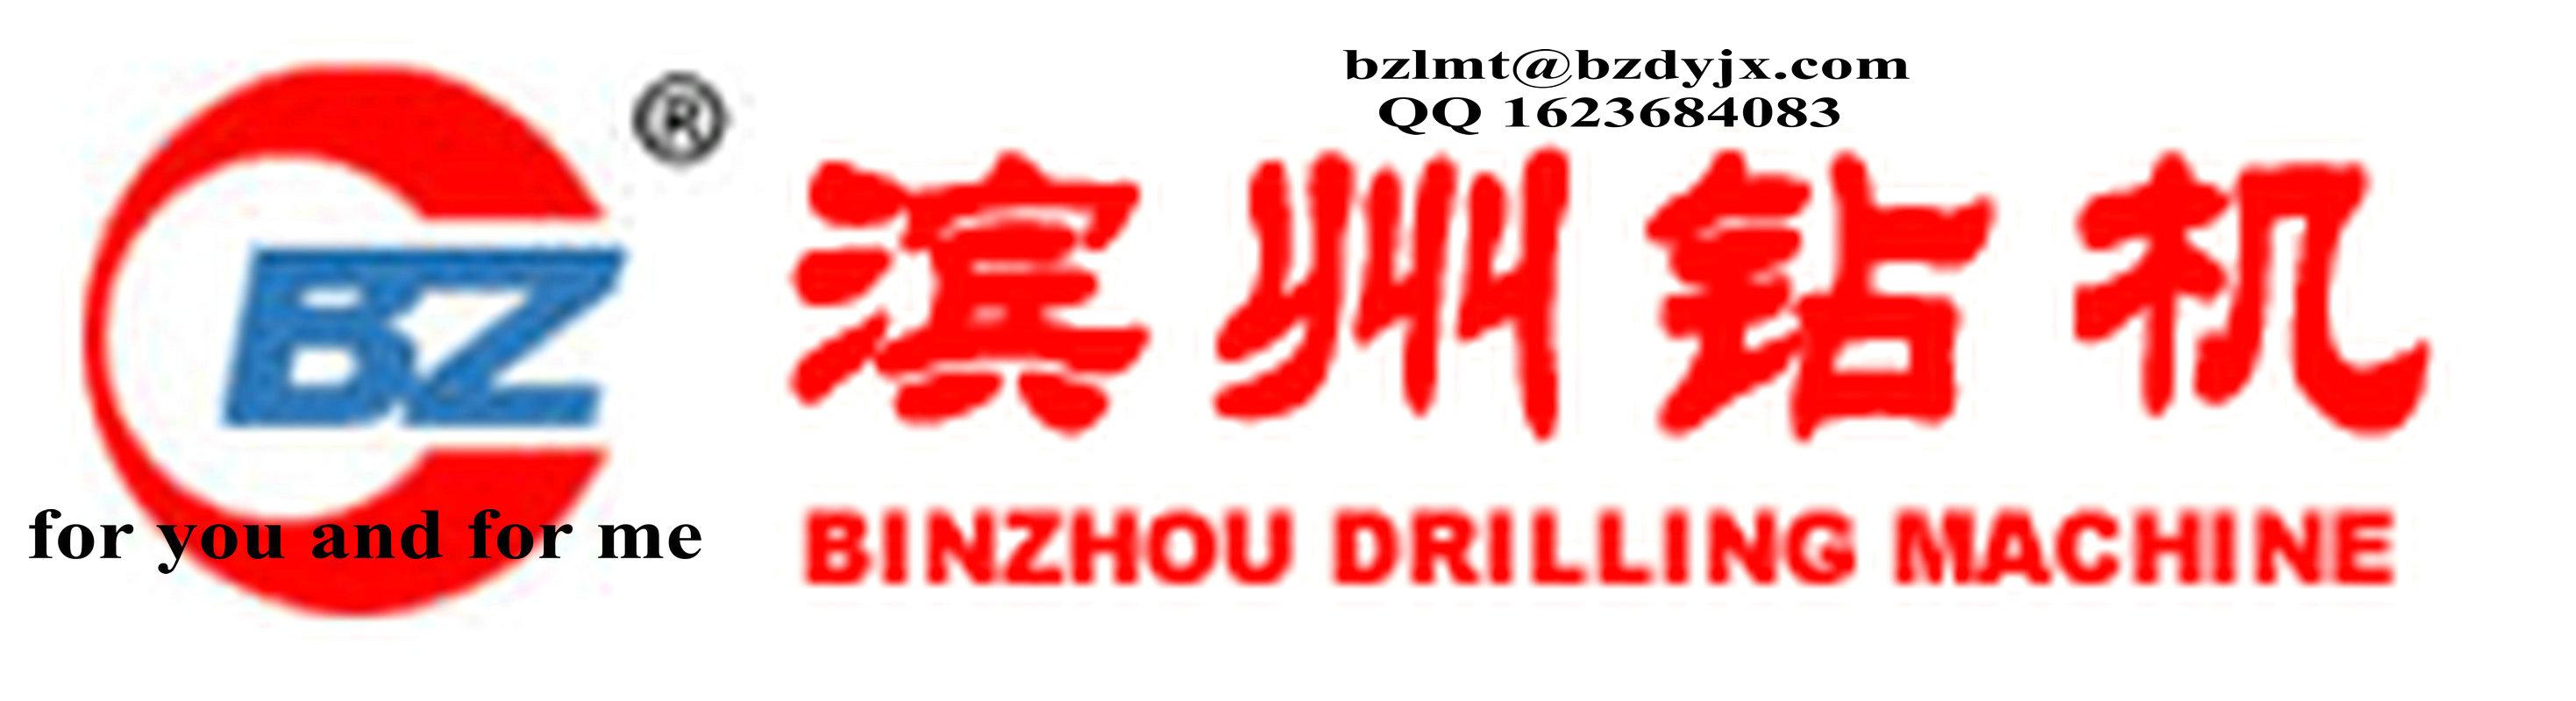 Shandong Binzhou Drilling Rigs Factory